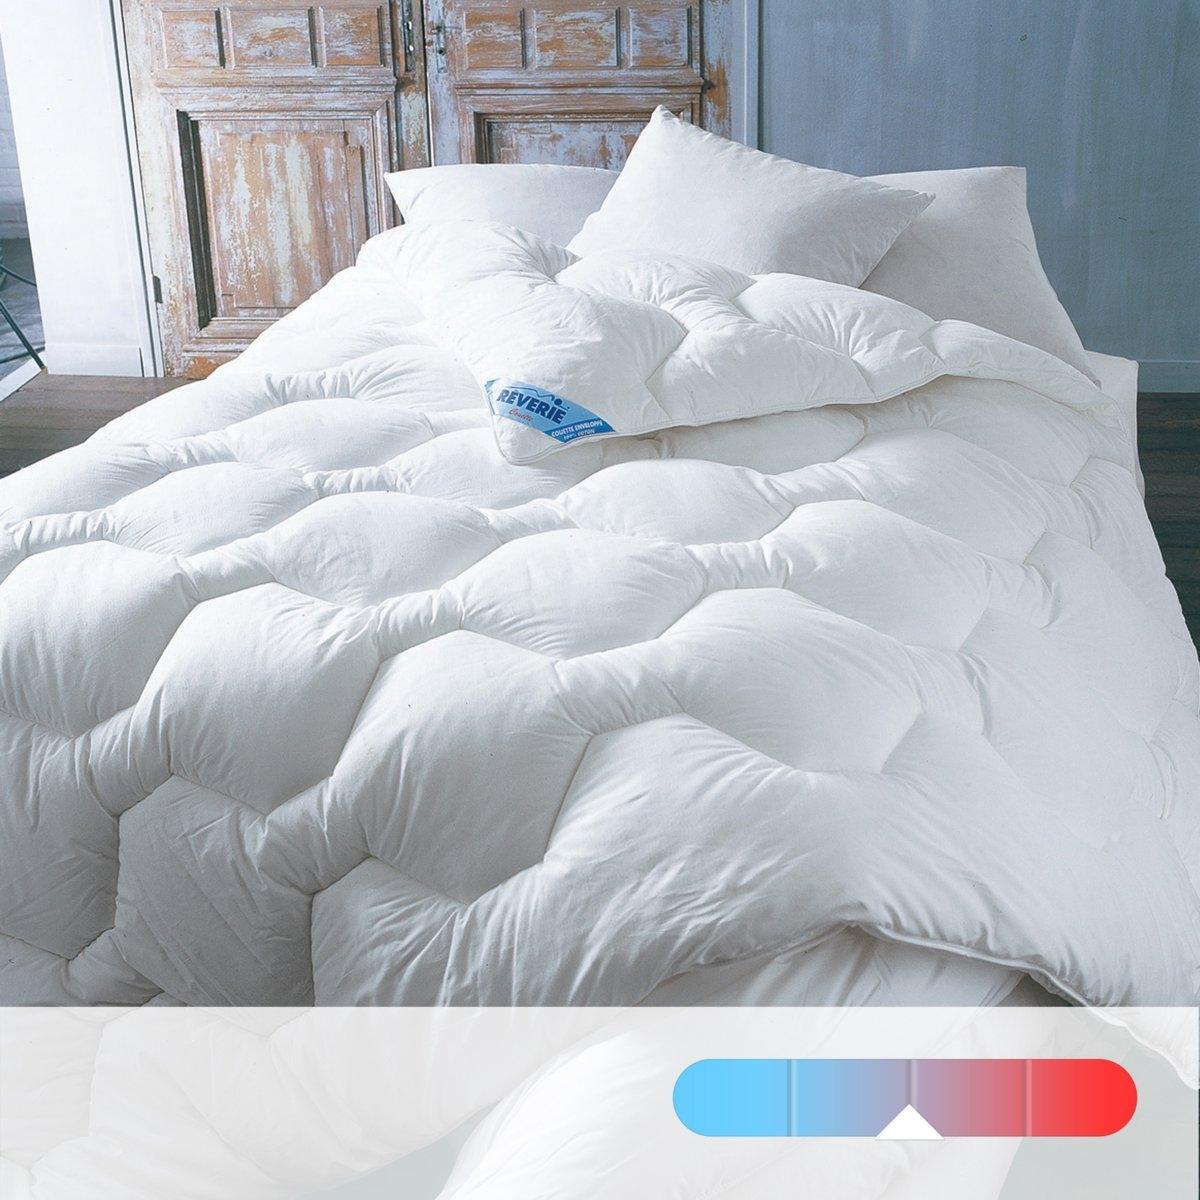 купить Одеяло La Redoute La Redoute 240 x 220 см белый по цене 11999 рублей